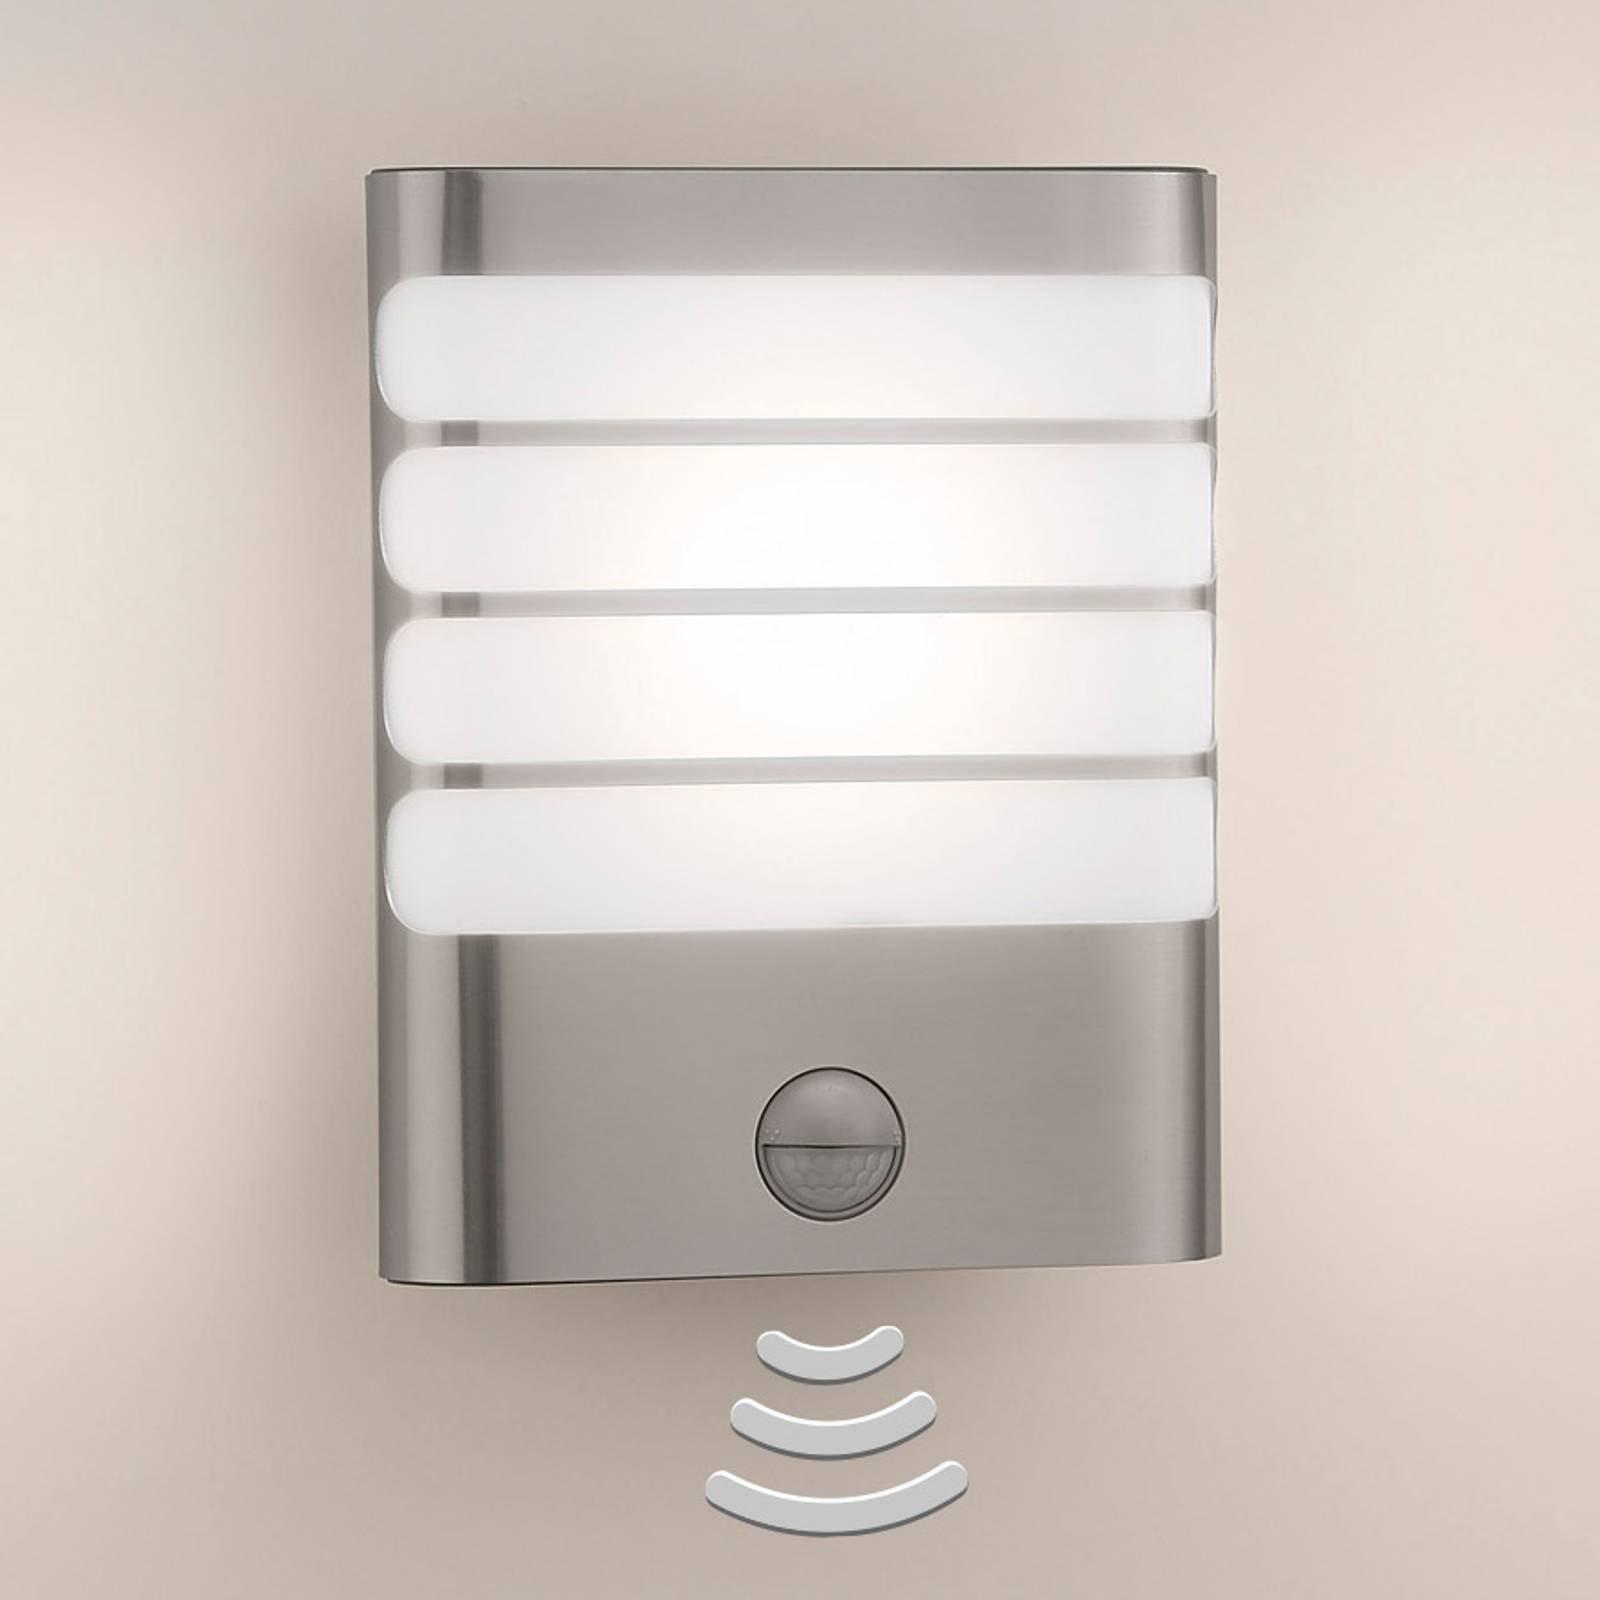 Philips Raccoon LED-utevegglys rustfritt stål